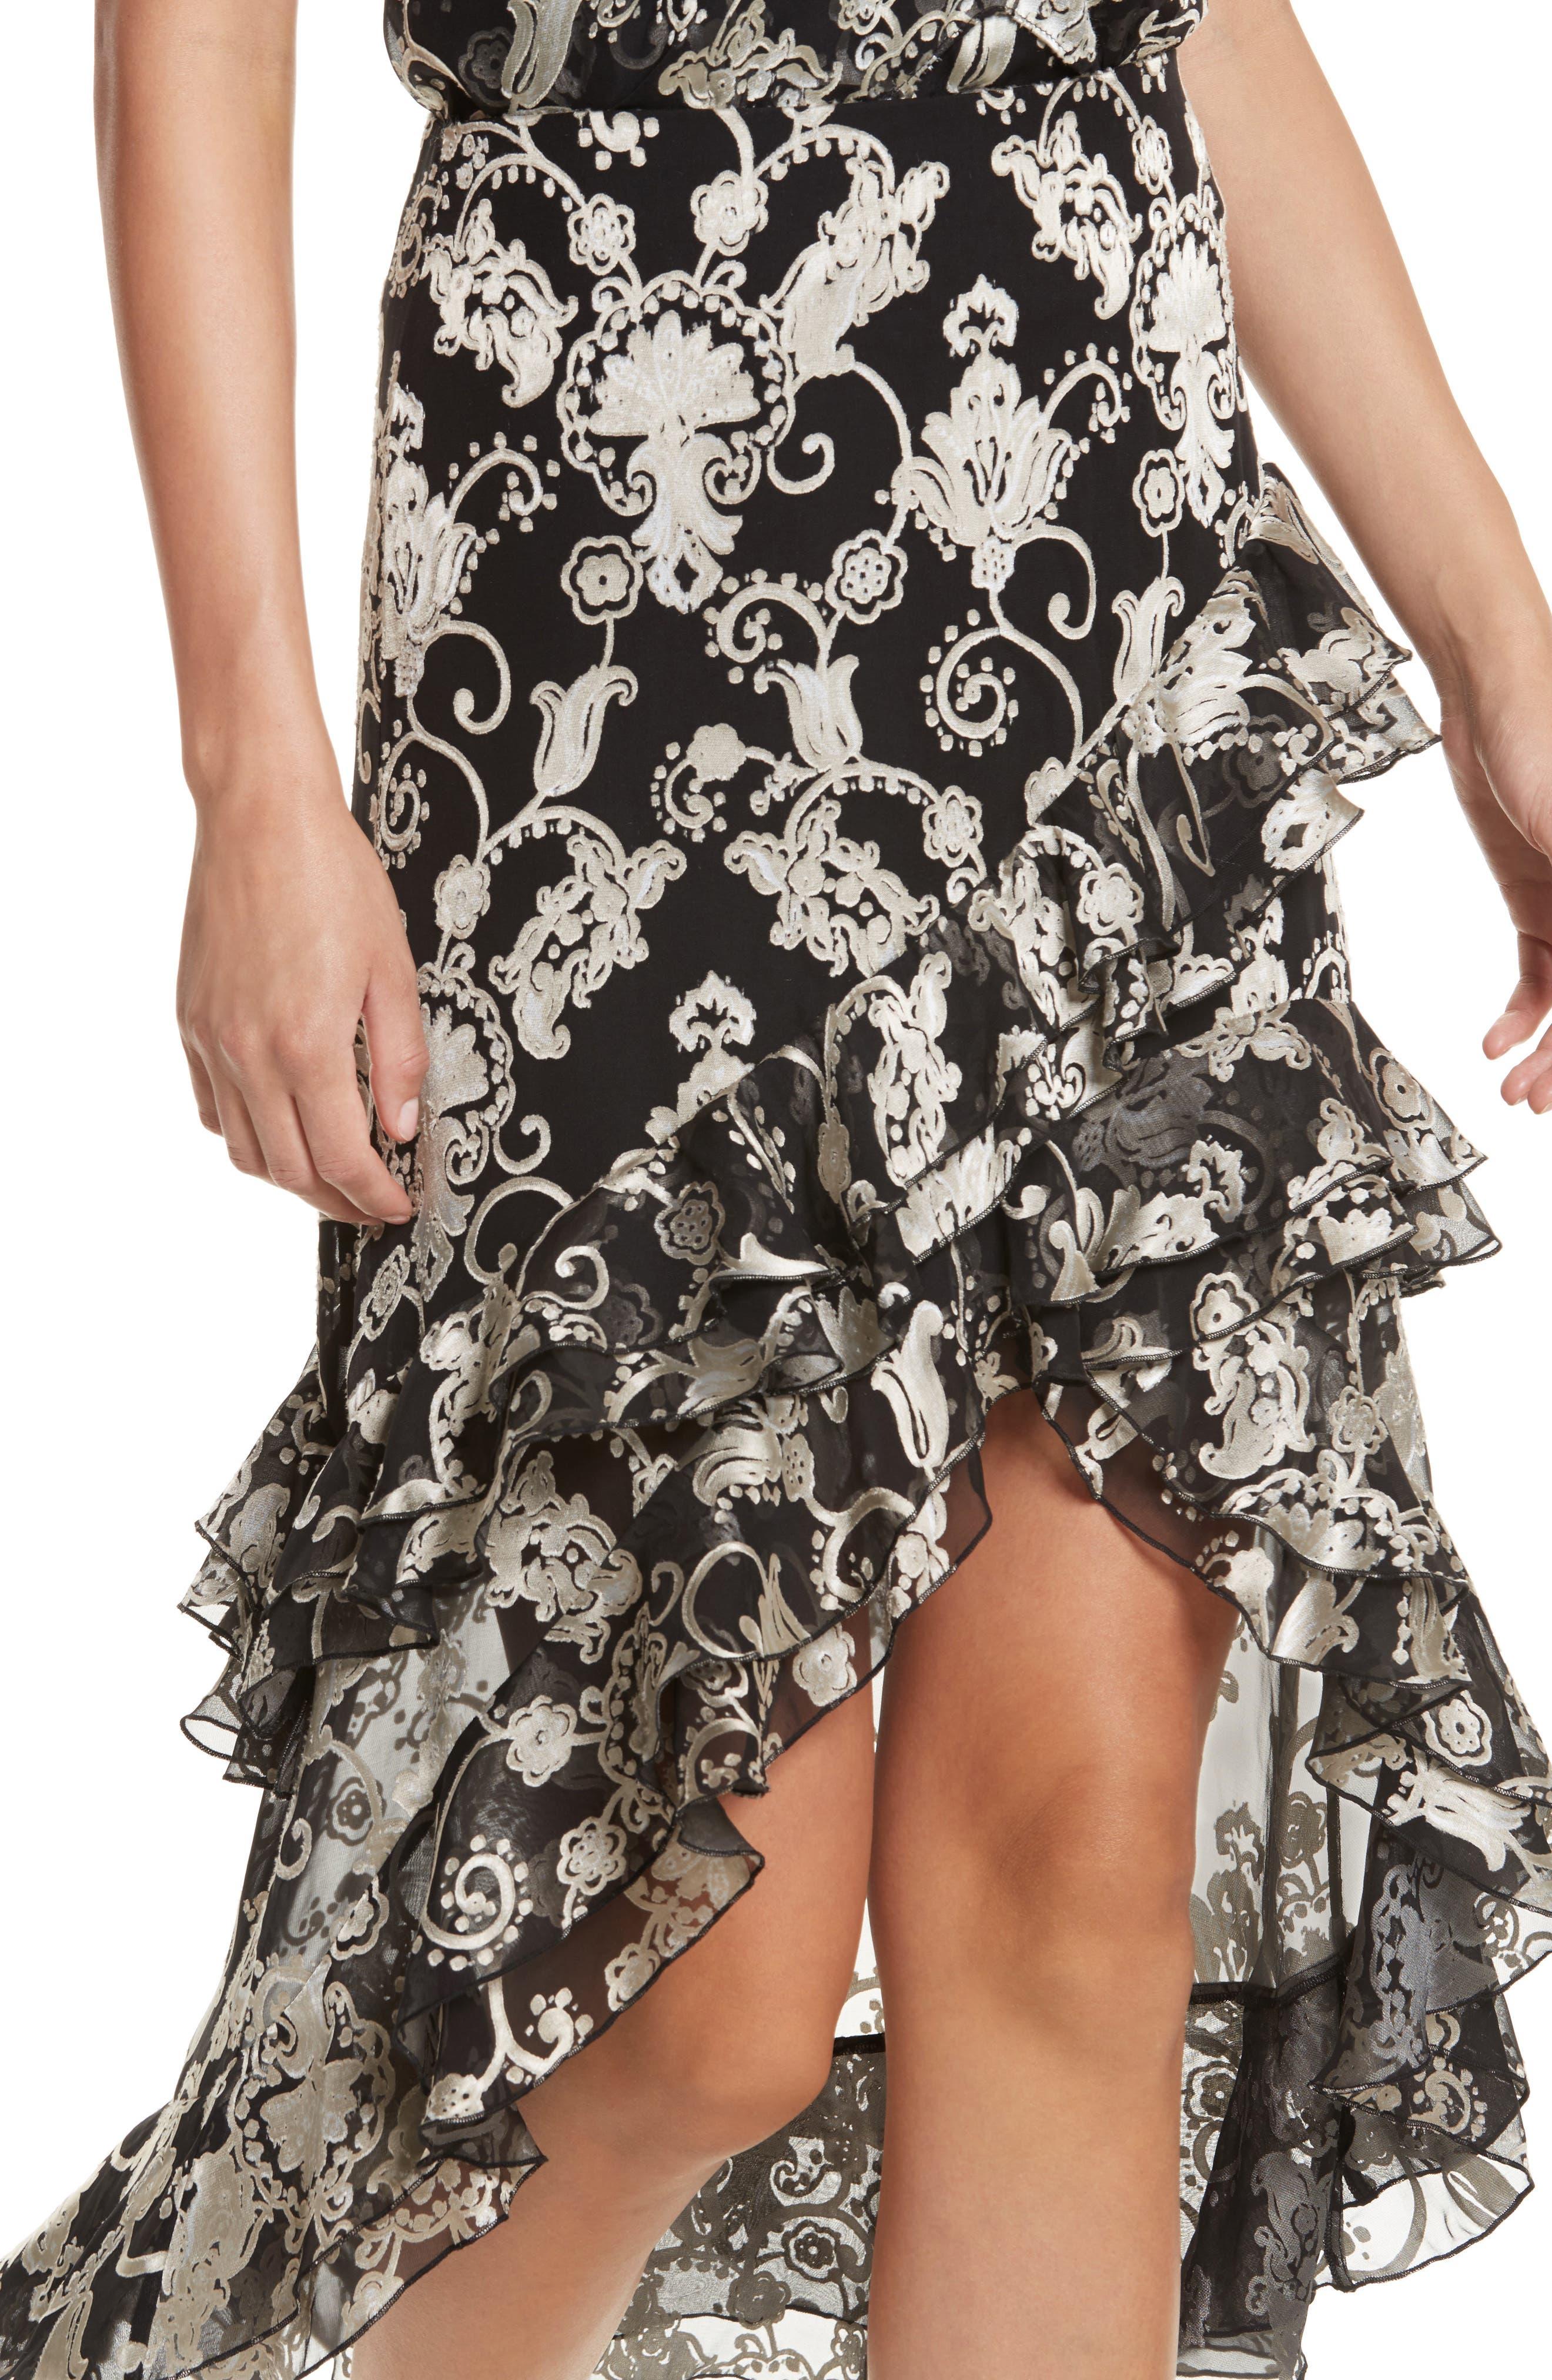 Sasha Asymmetrical Tiered Ruffle Skirt,                             Alternate thumbnail 5, color,                             Black/ White